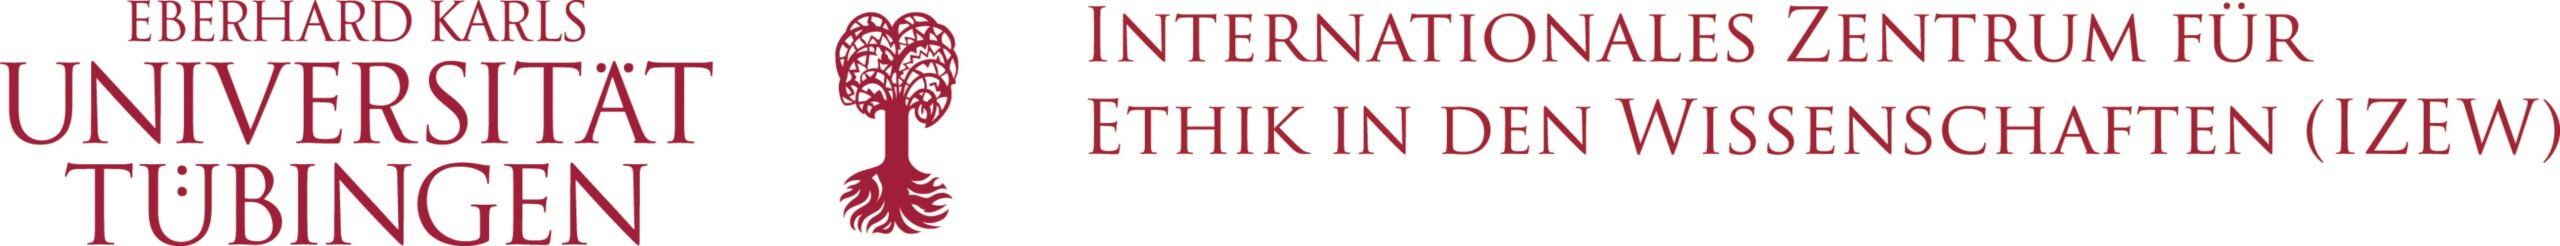 University of Tübingen, International Center for Ethics in the Sciences and Humanities (IZEW)